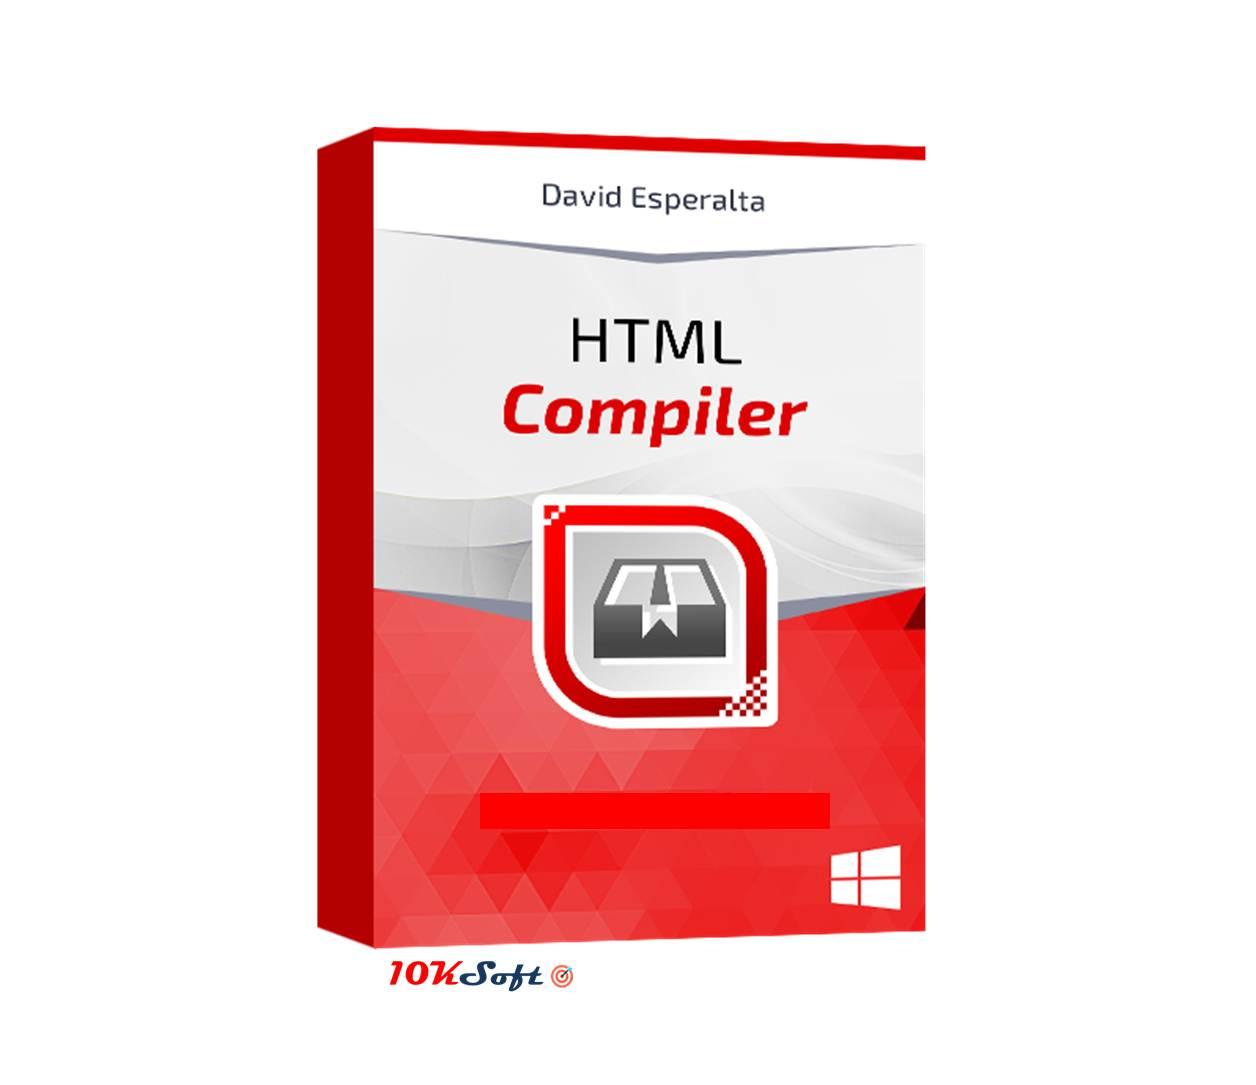 HTML Compiler Free Download